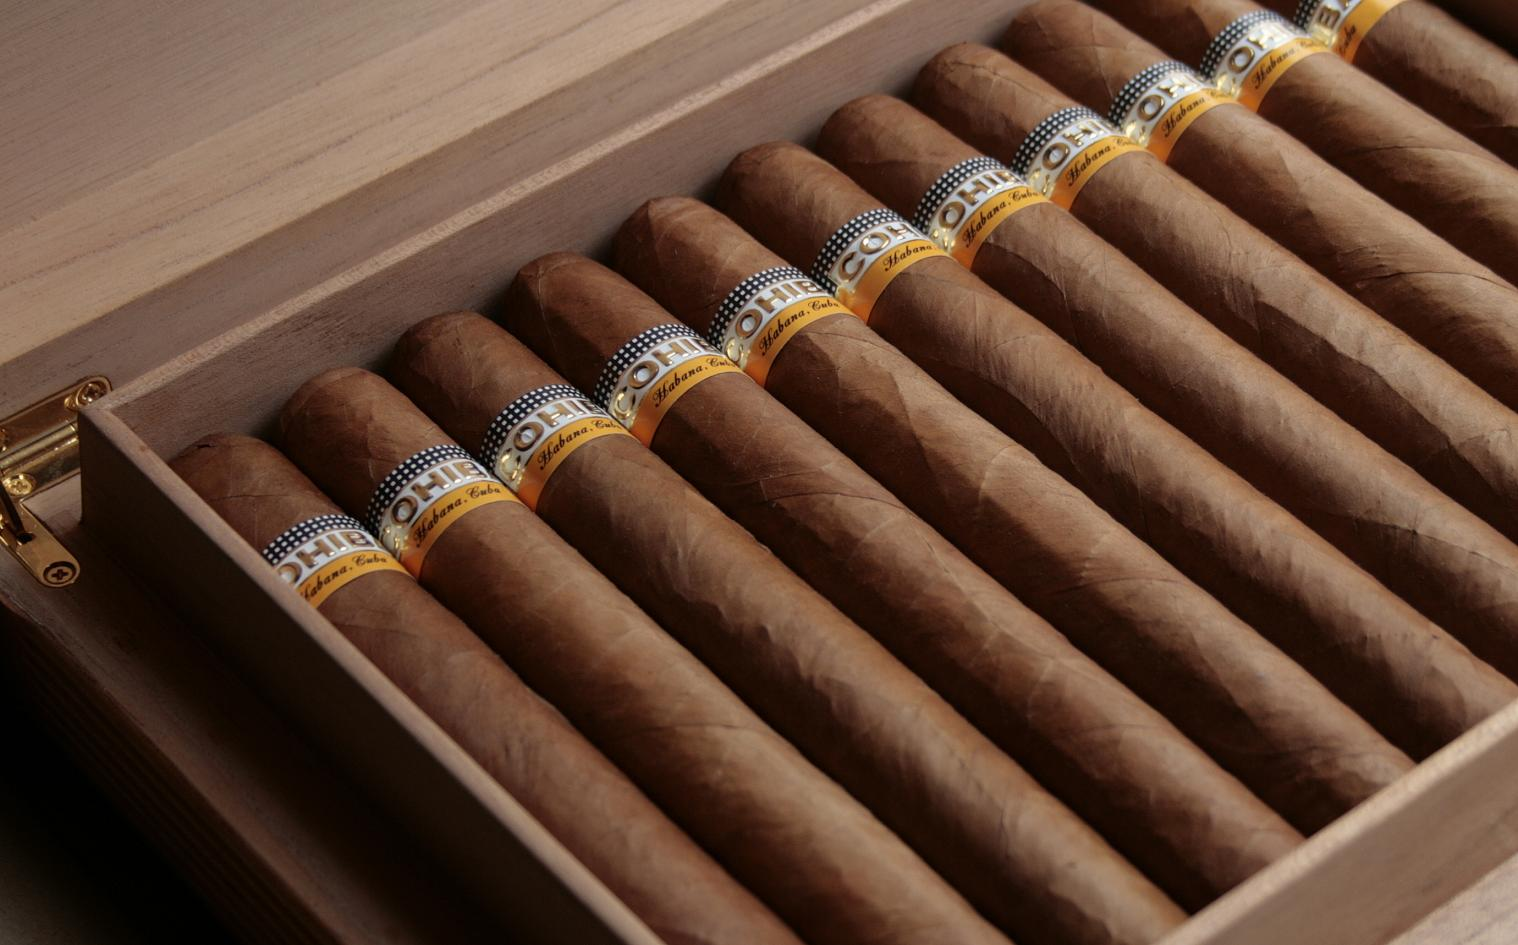 cohiba_habanos_cigar_szivarvilag_cohiba_szivar_1.jpg